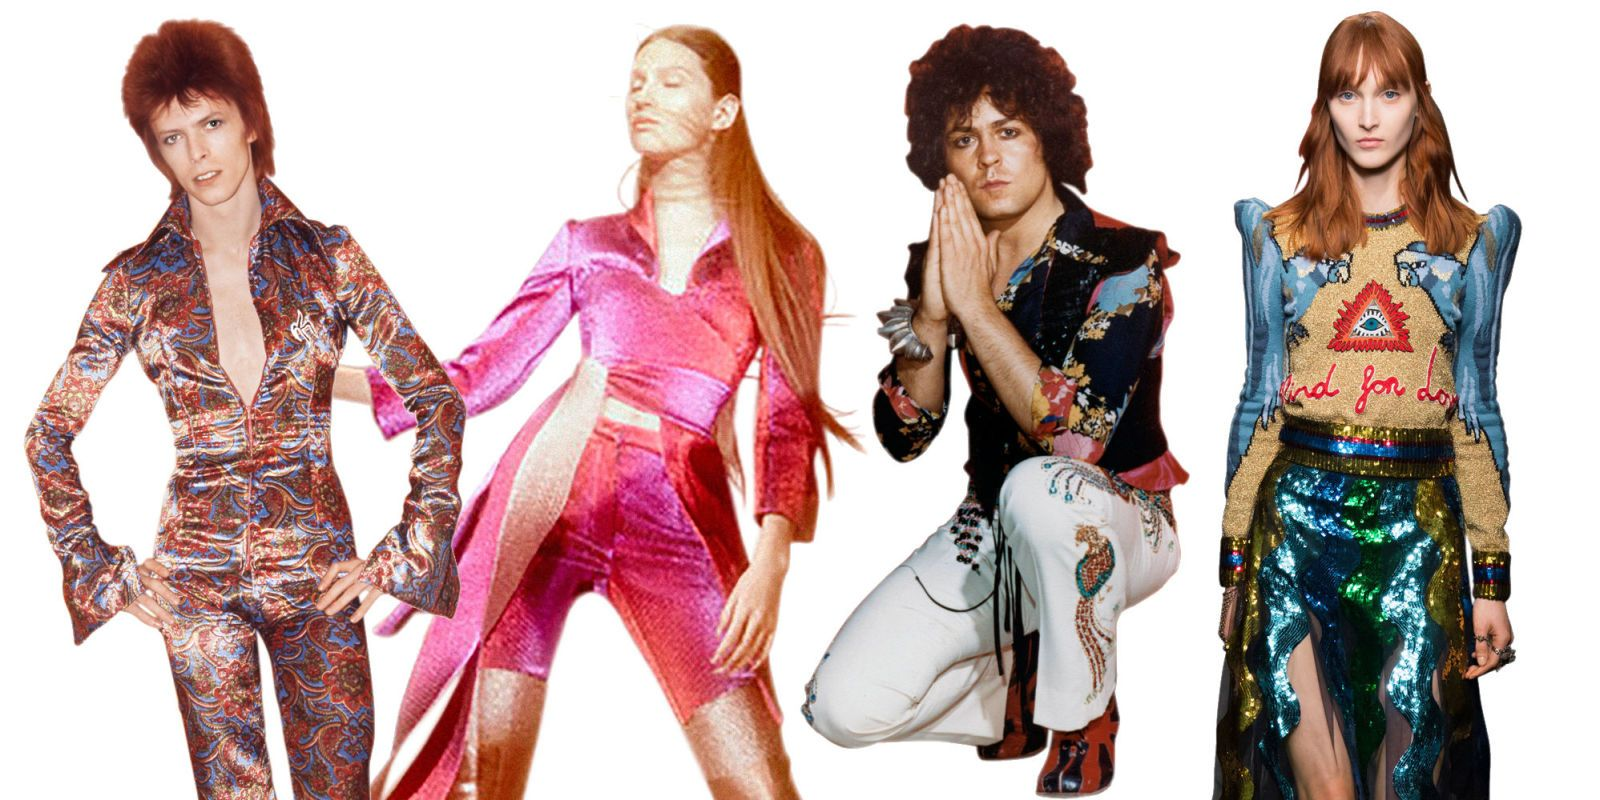 glam rock instruments